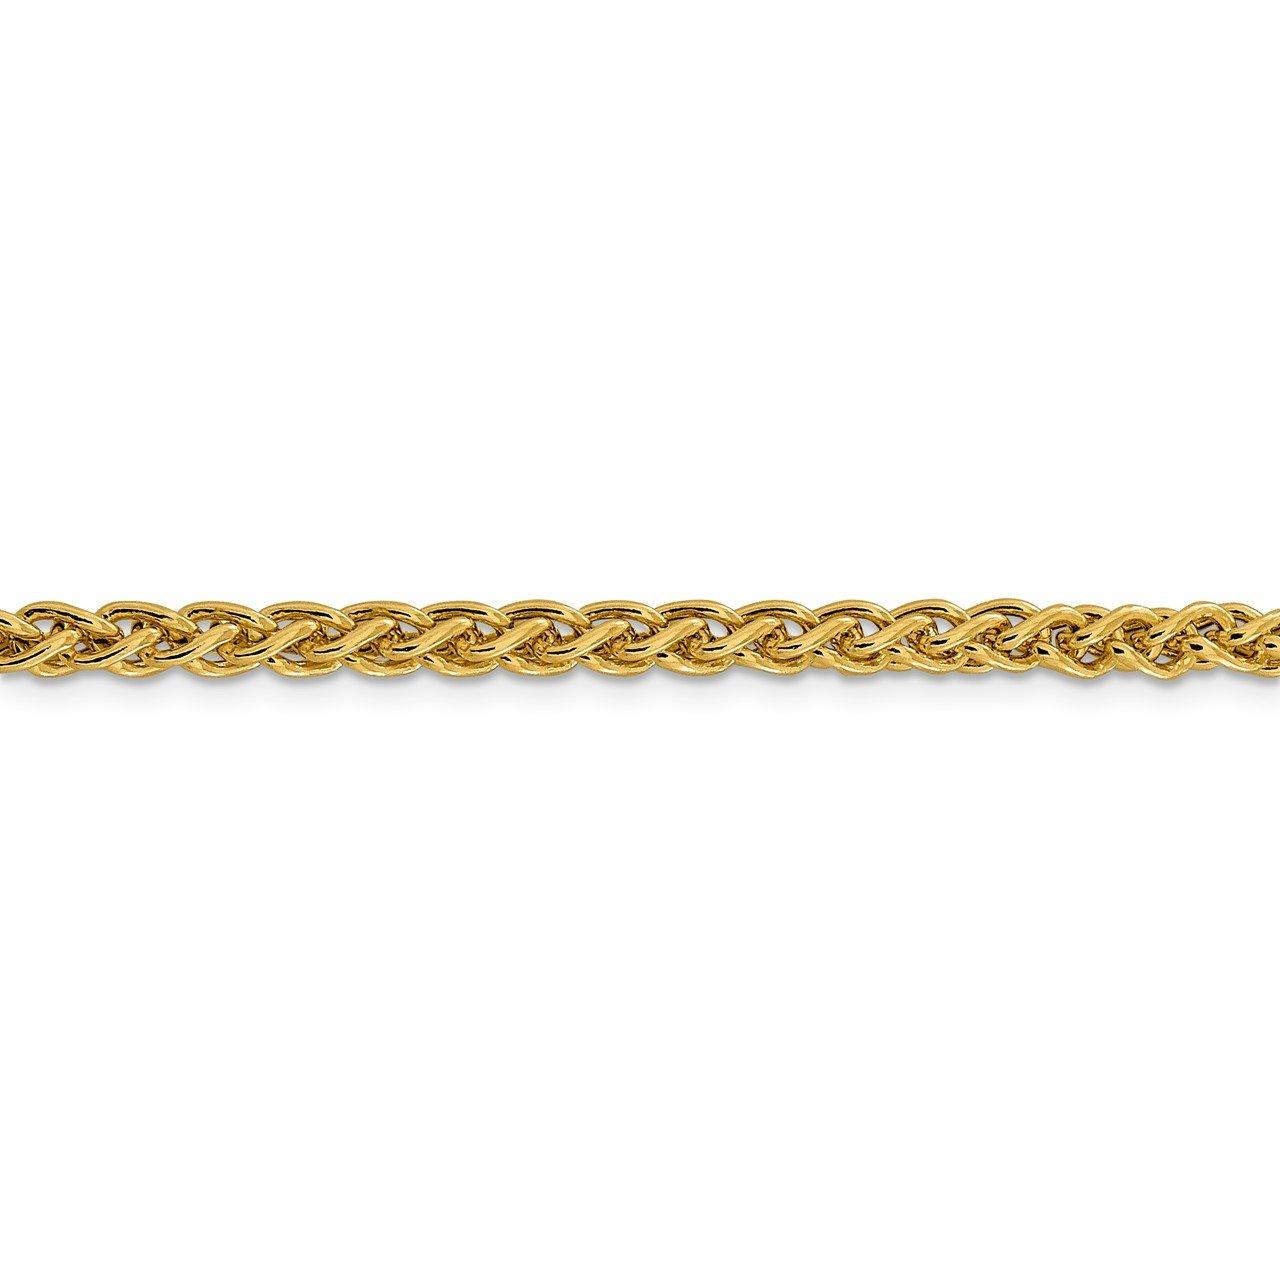 14k 4.15mm Semi-solid Wheat Chain-2